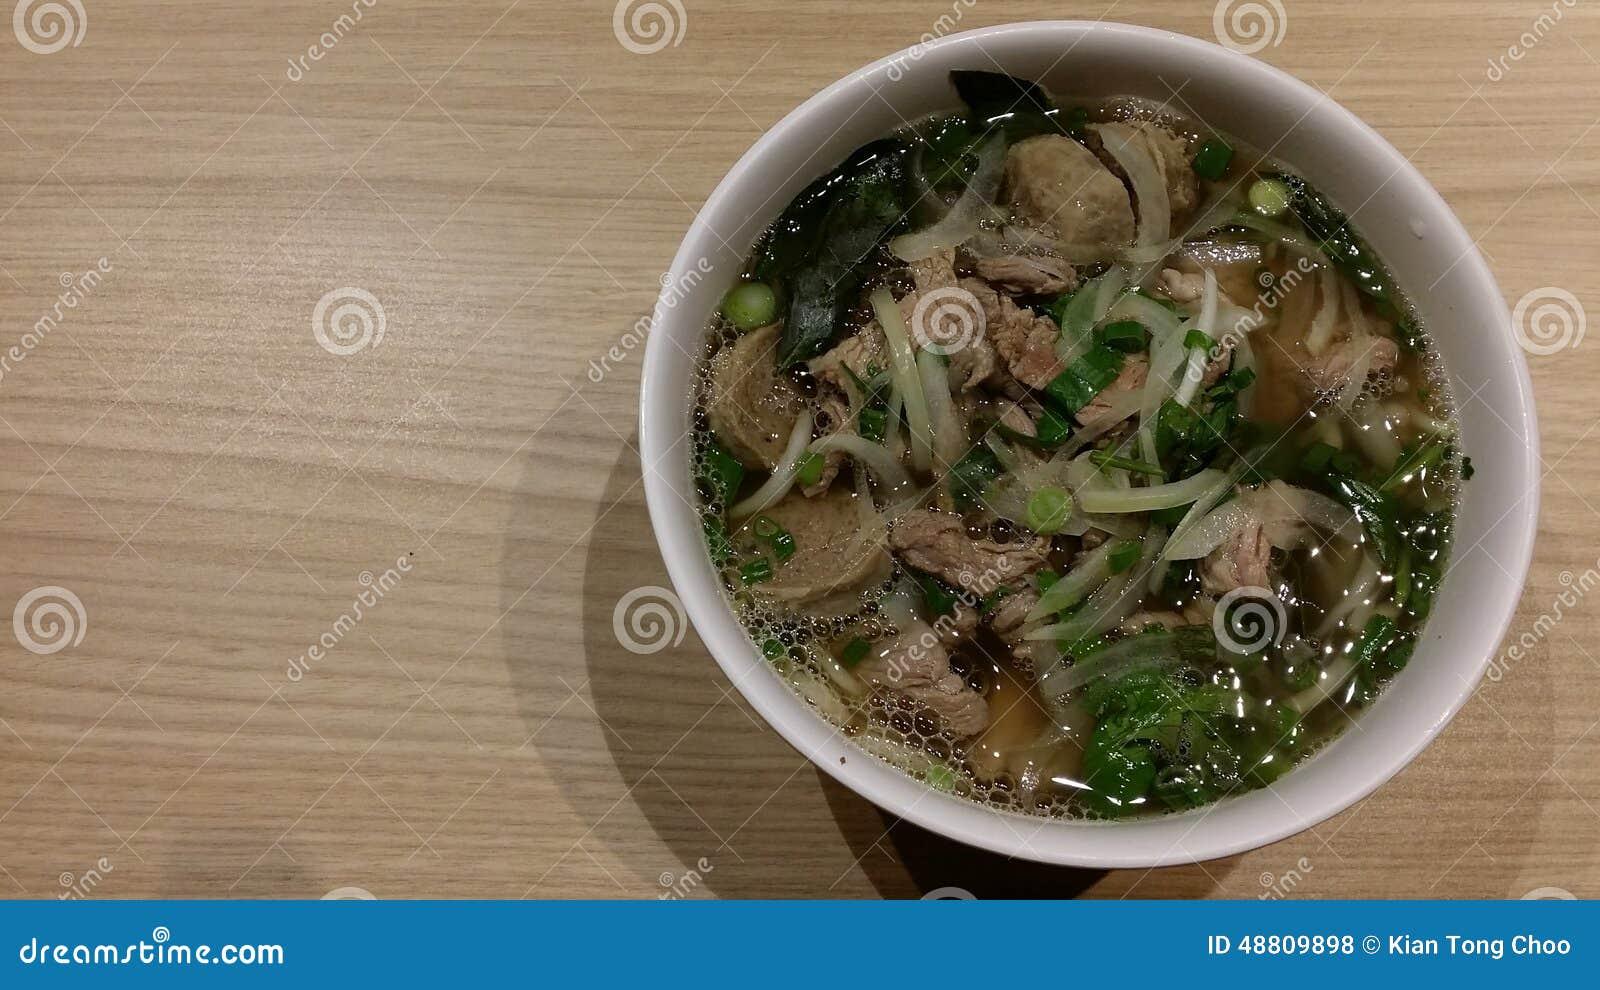 traditional beef pho soup mr no pr no 0 21 0